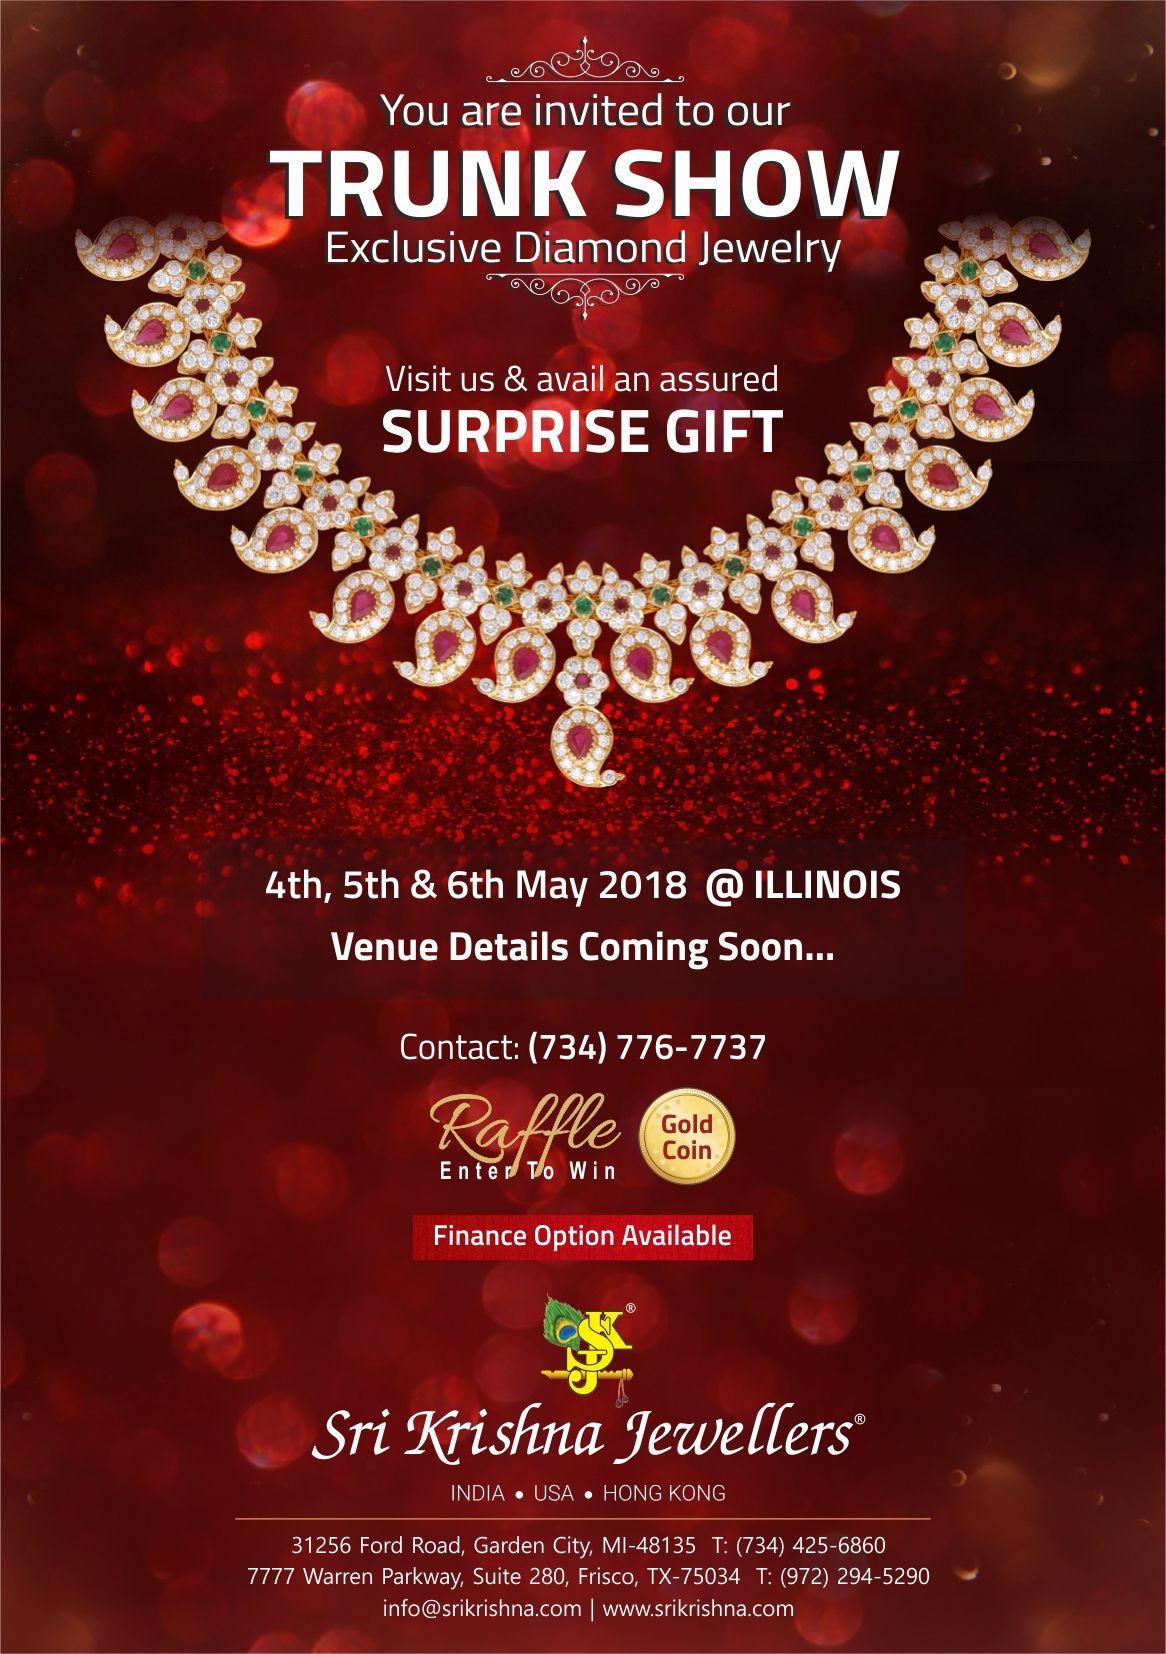 Sri Krishna Jewellers - Trunk Show in Illinois: Exclusive Diamond Jewelry